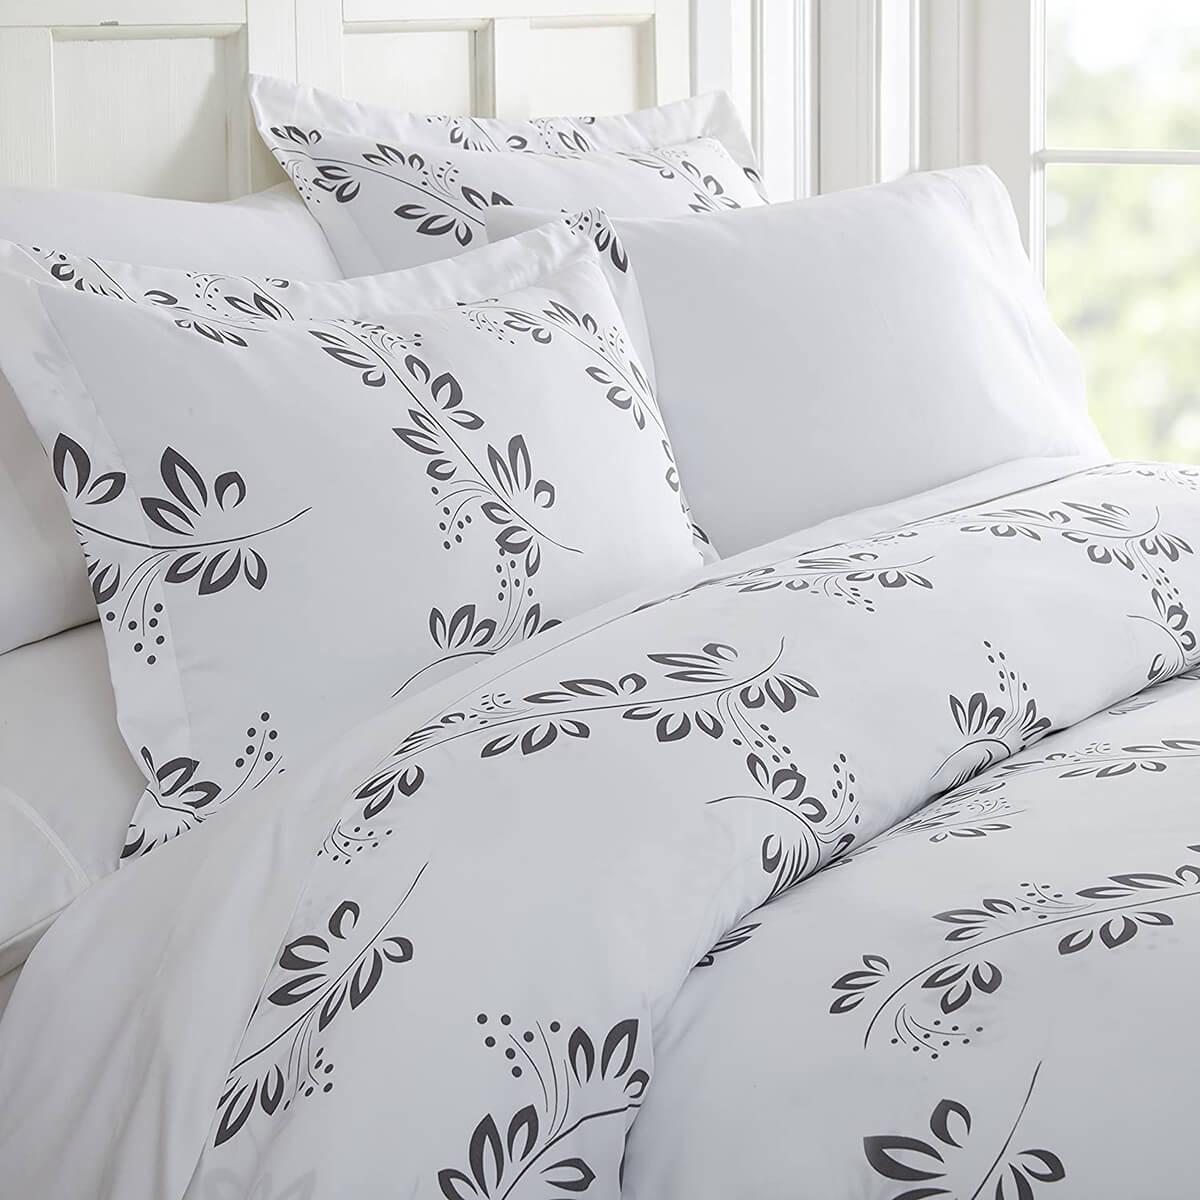 You Choose the Pattern Linen Market Duvet